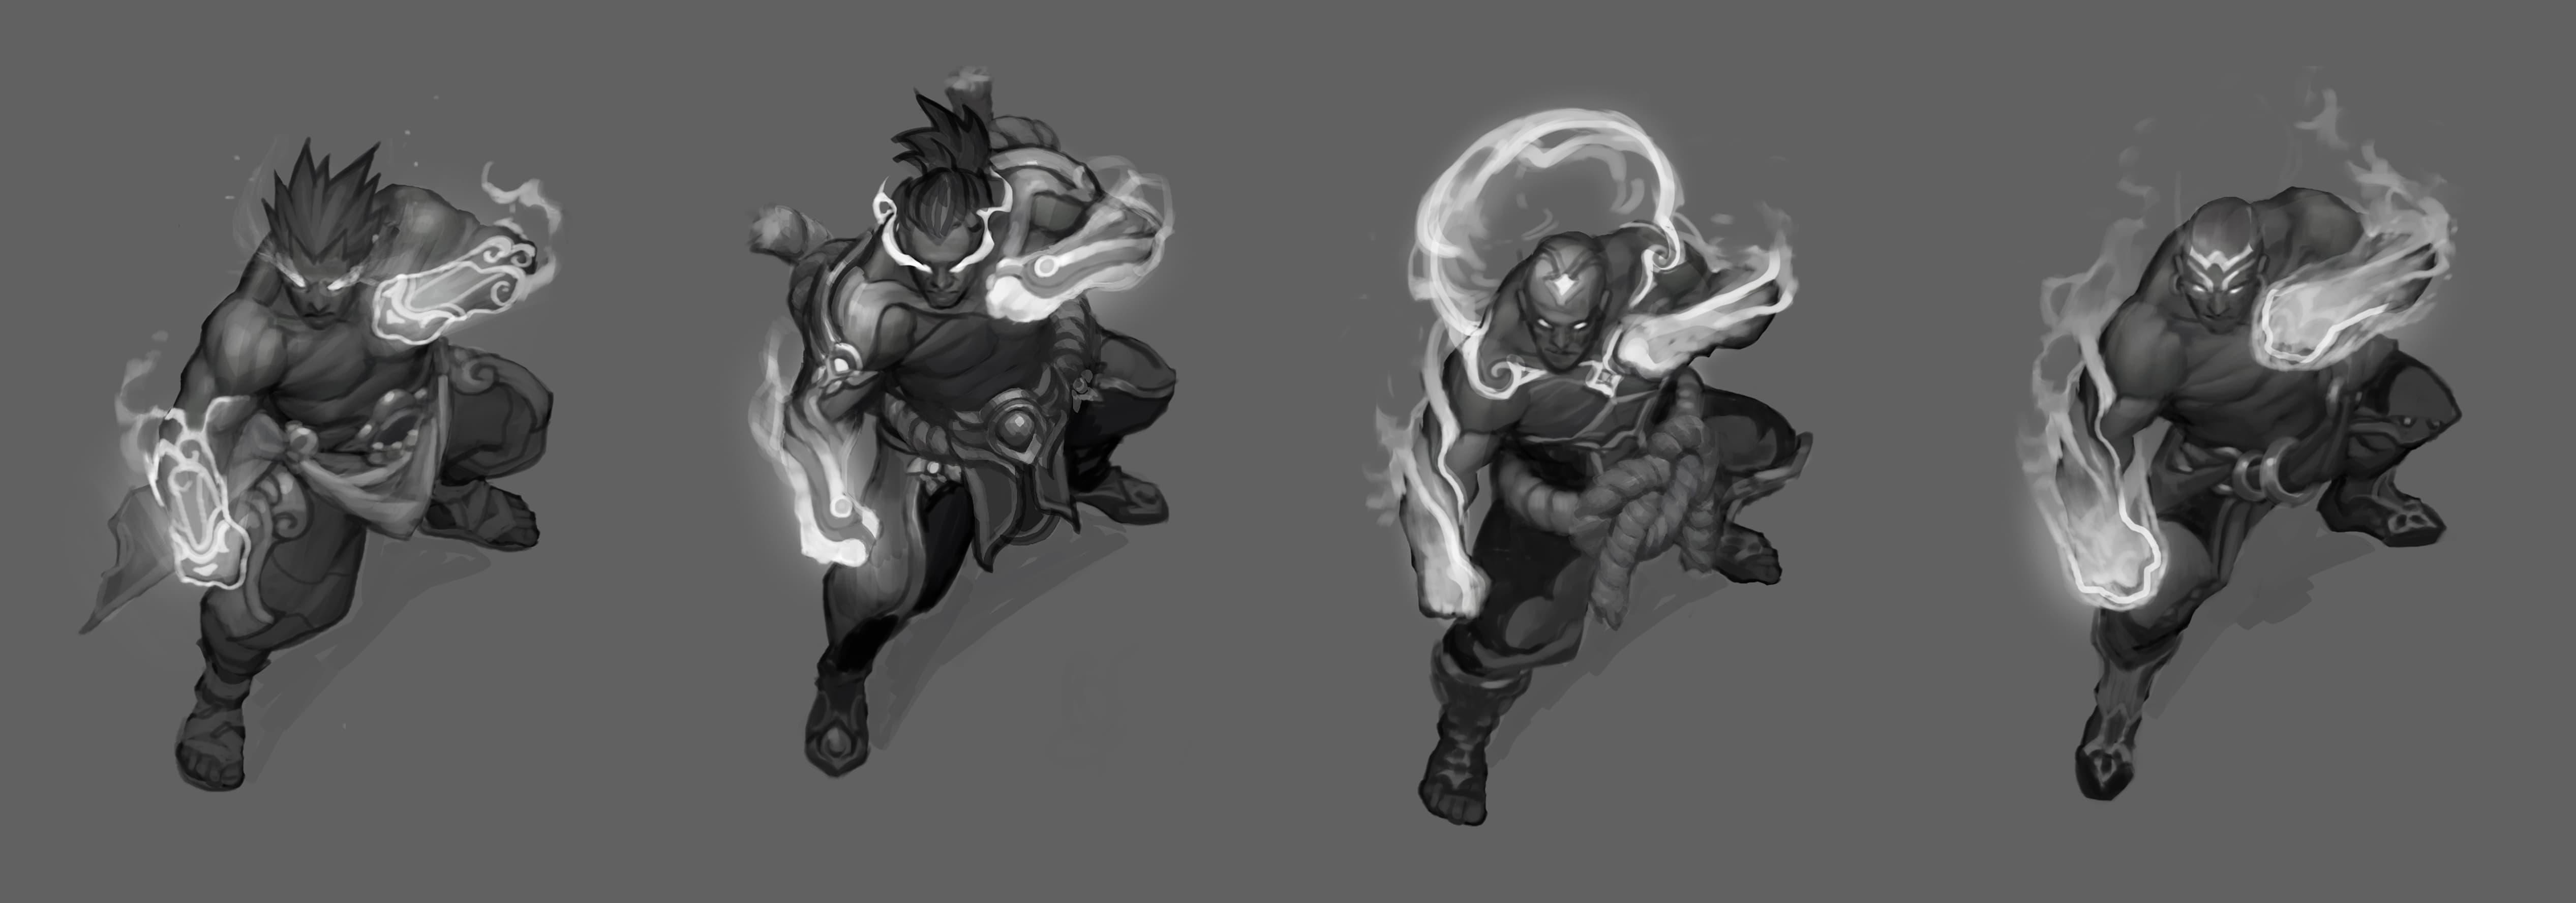 God Fist Lee Sin Concept Art